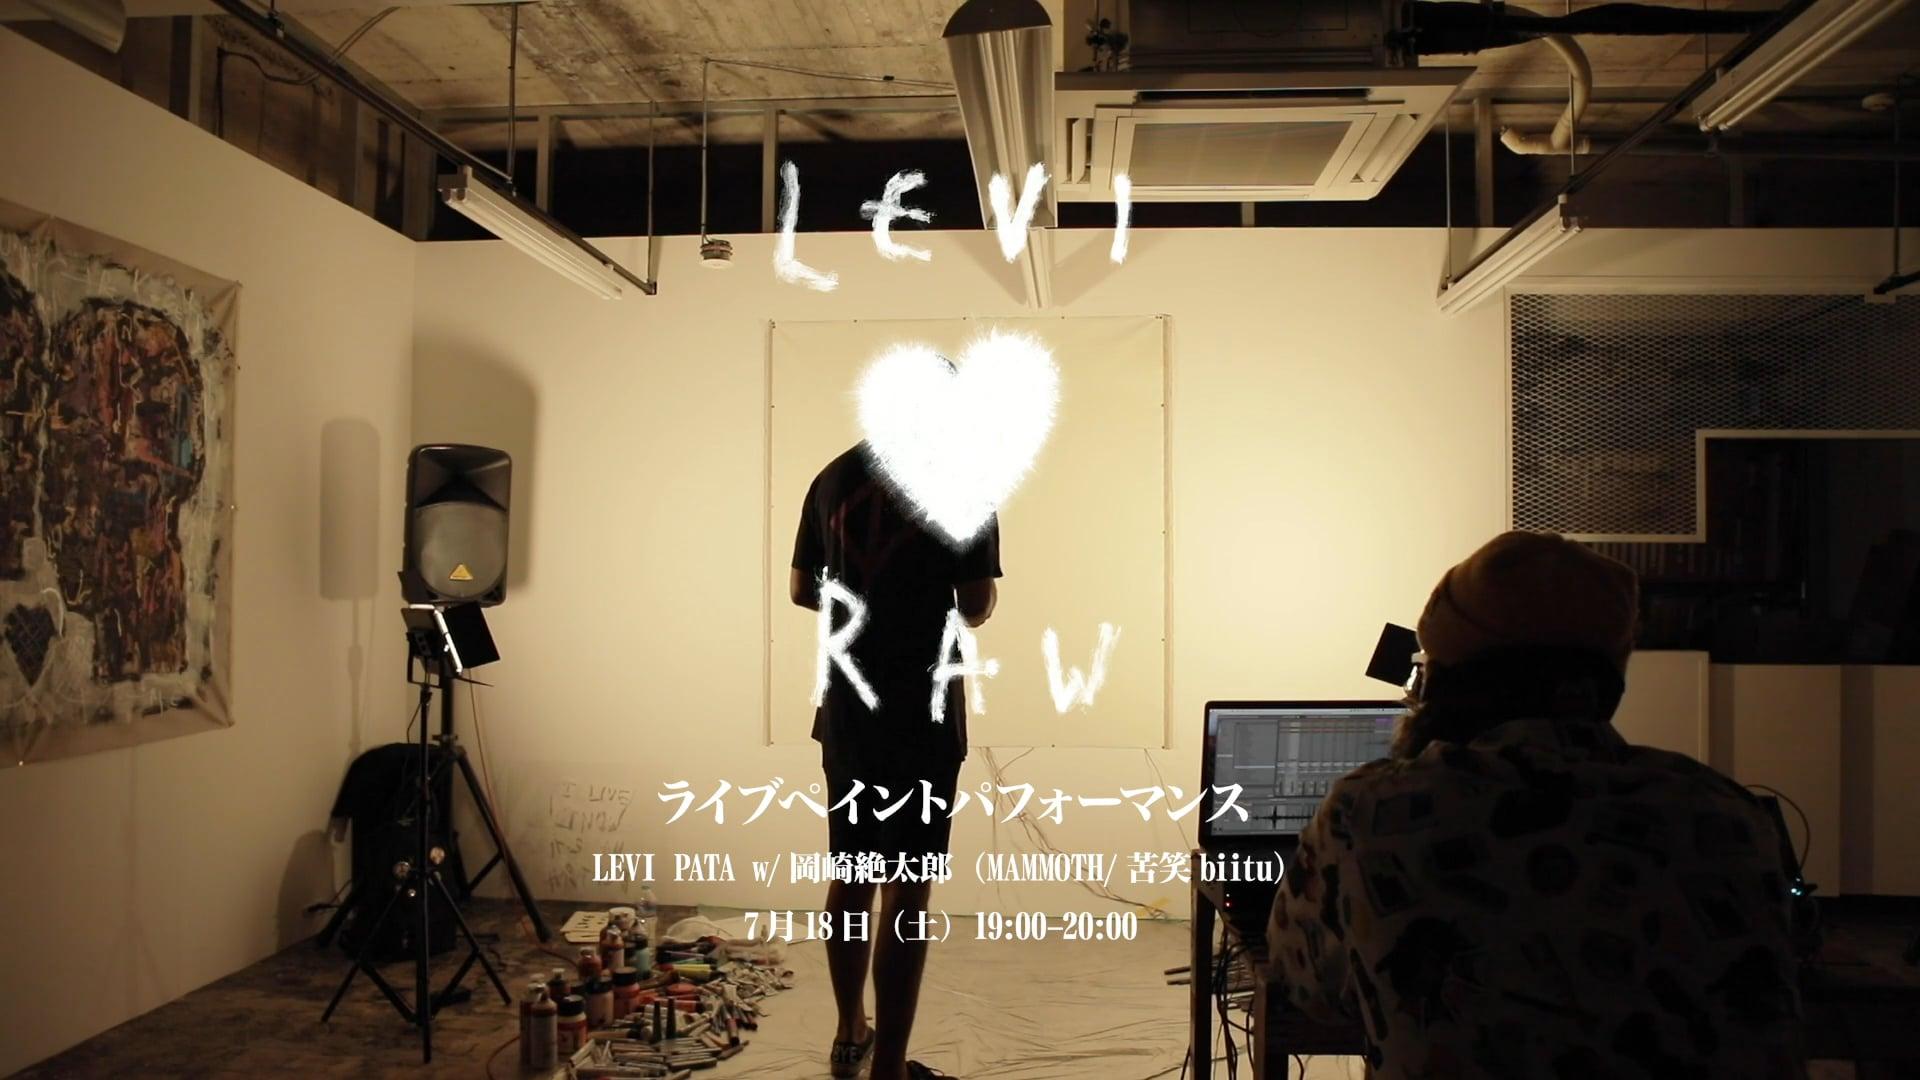 LEVI PATA × 岡崎 絶太郎 PAINT SHOW at BAF Stuio Tokyo